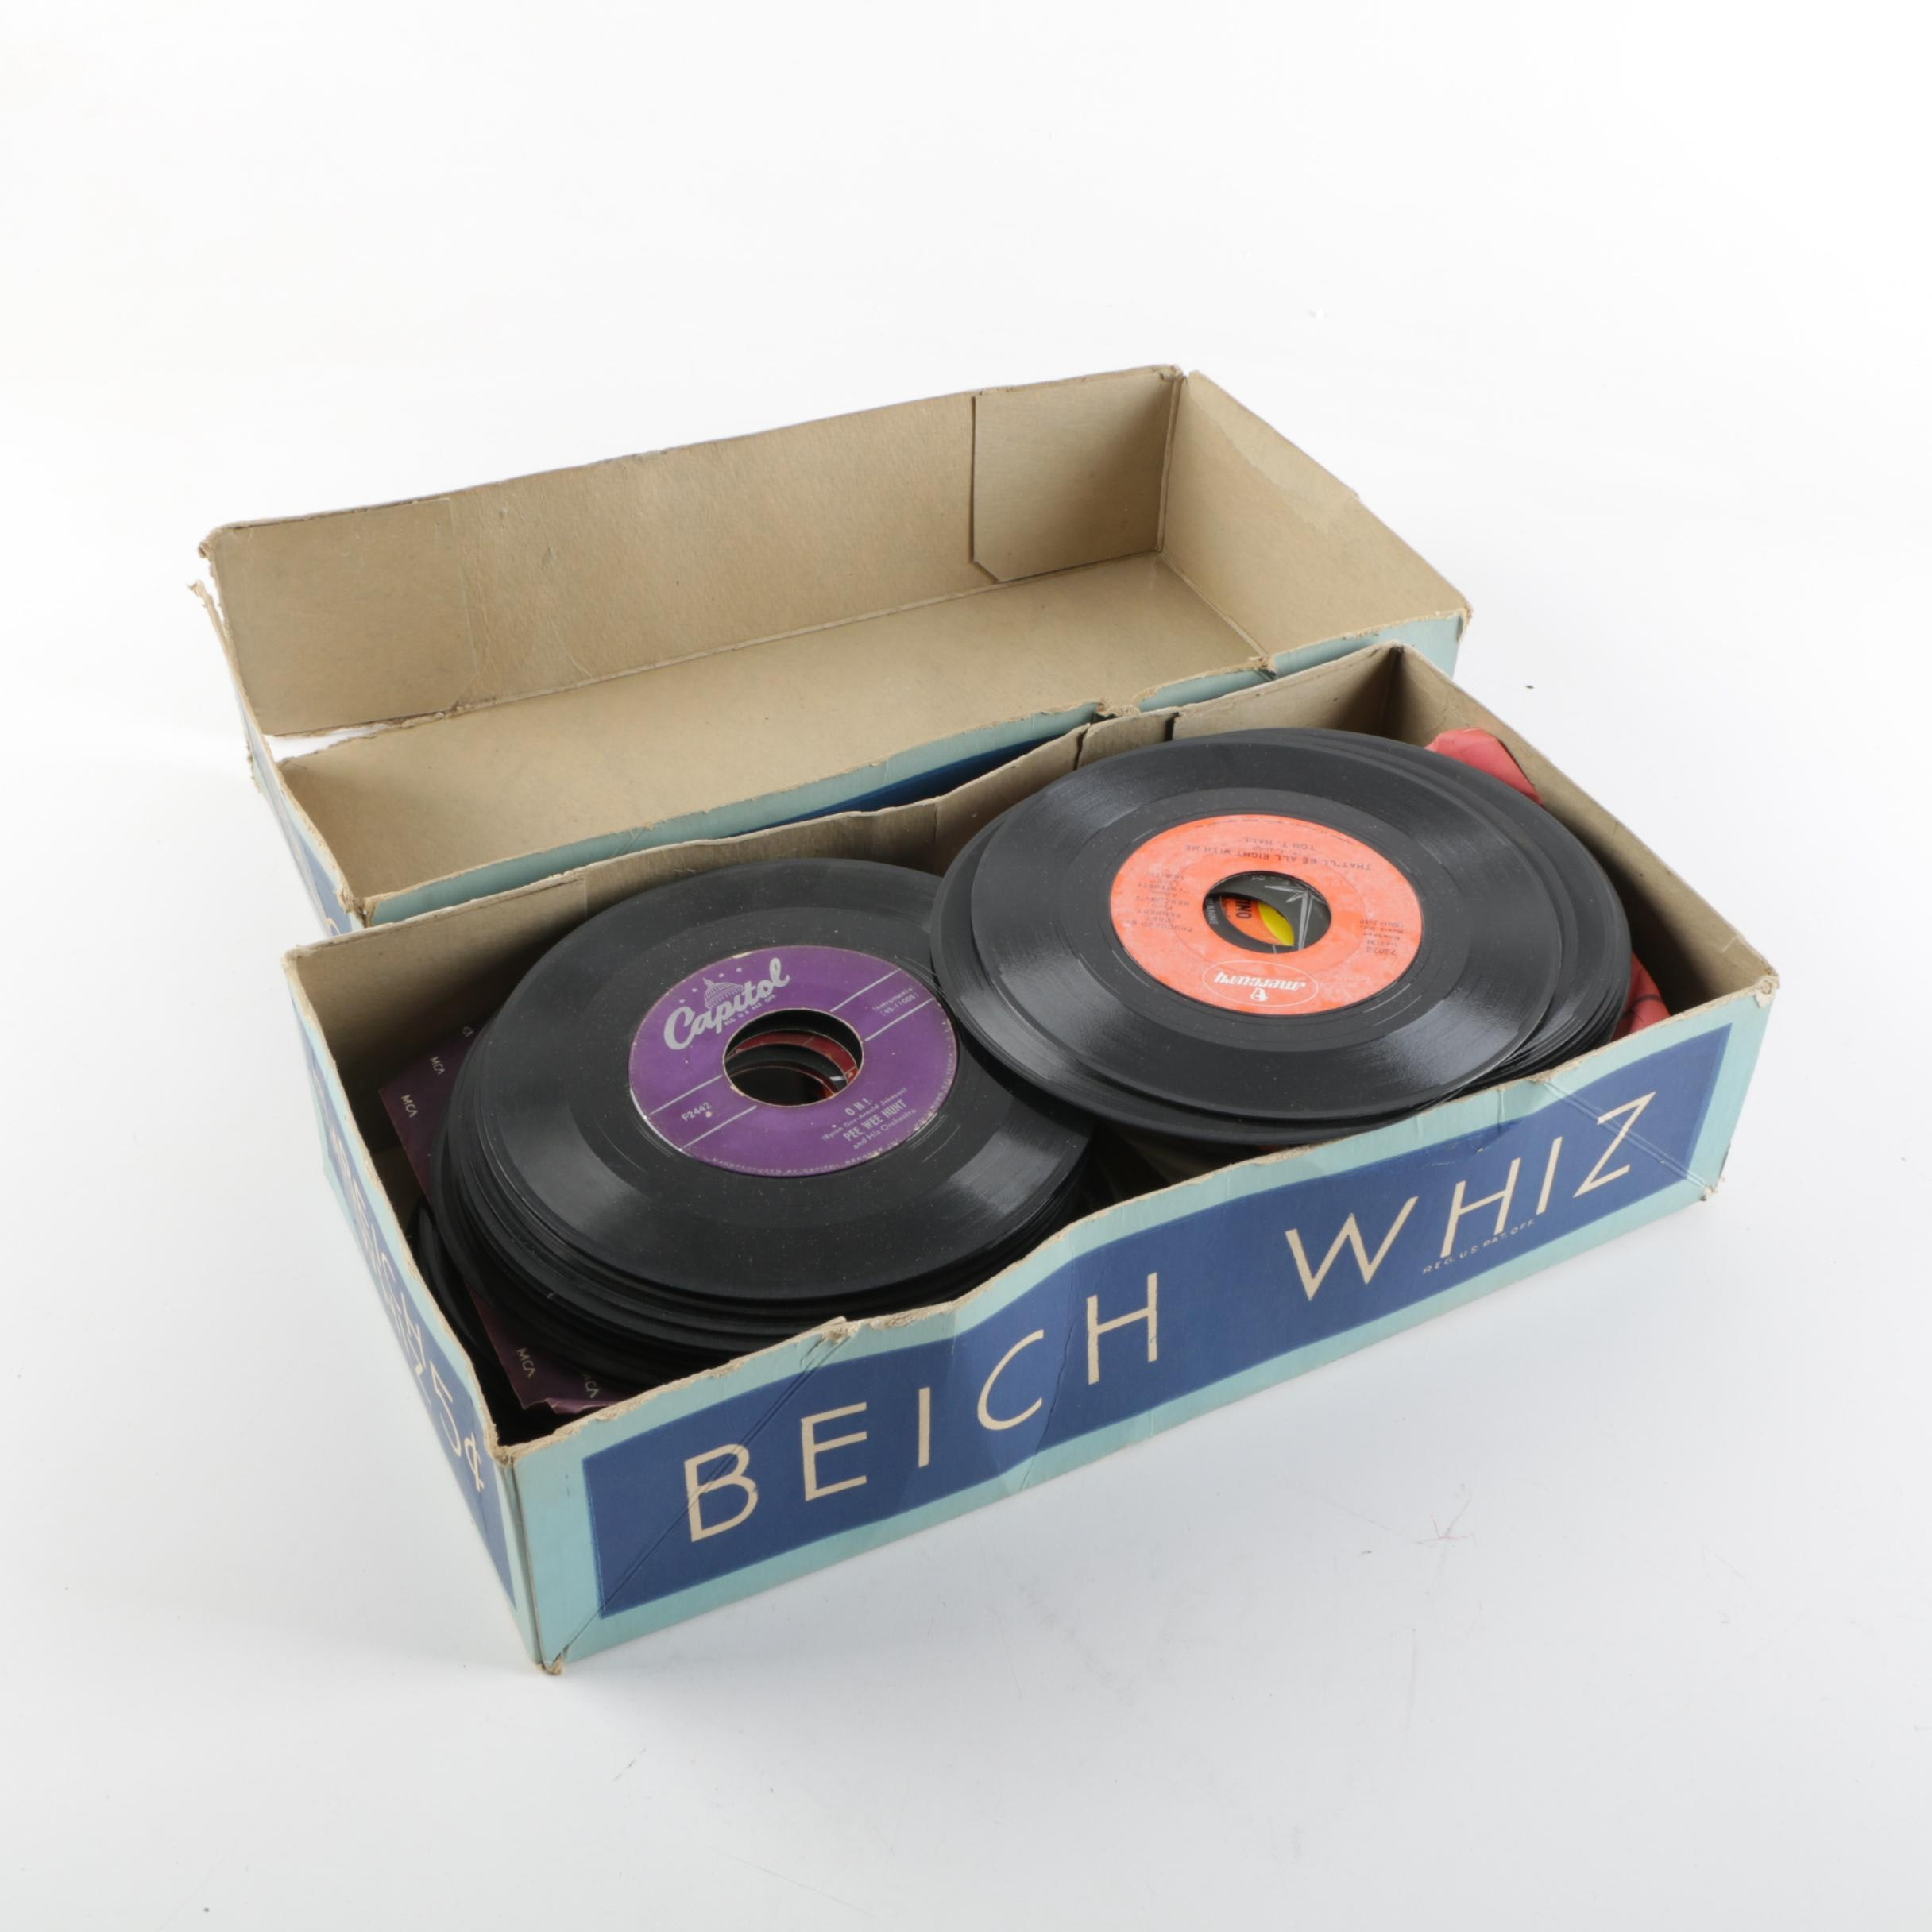 Vintage 45 RPM Single Records Including Sammy Davis Jr. and Ike and Tina Turner